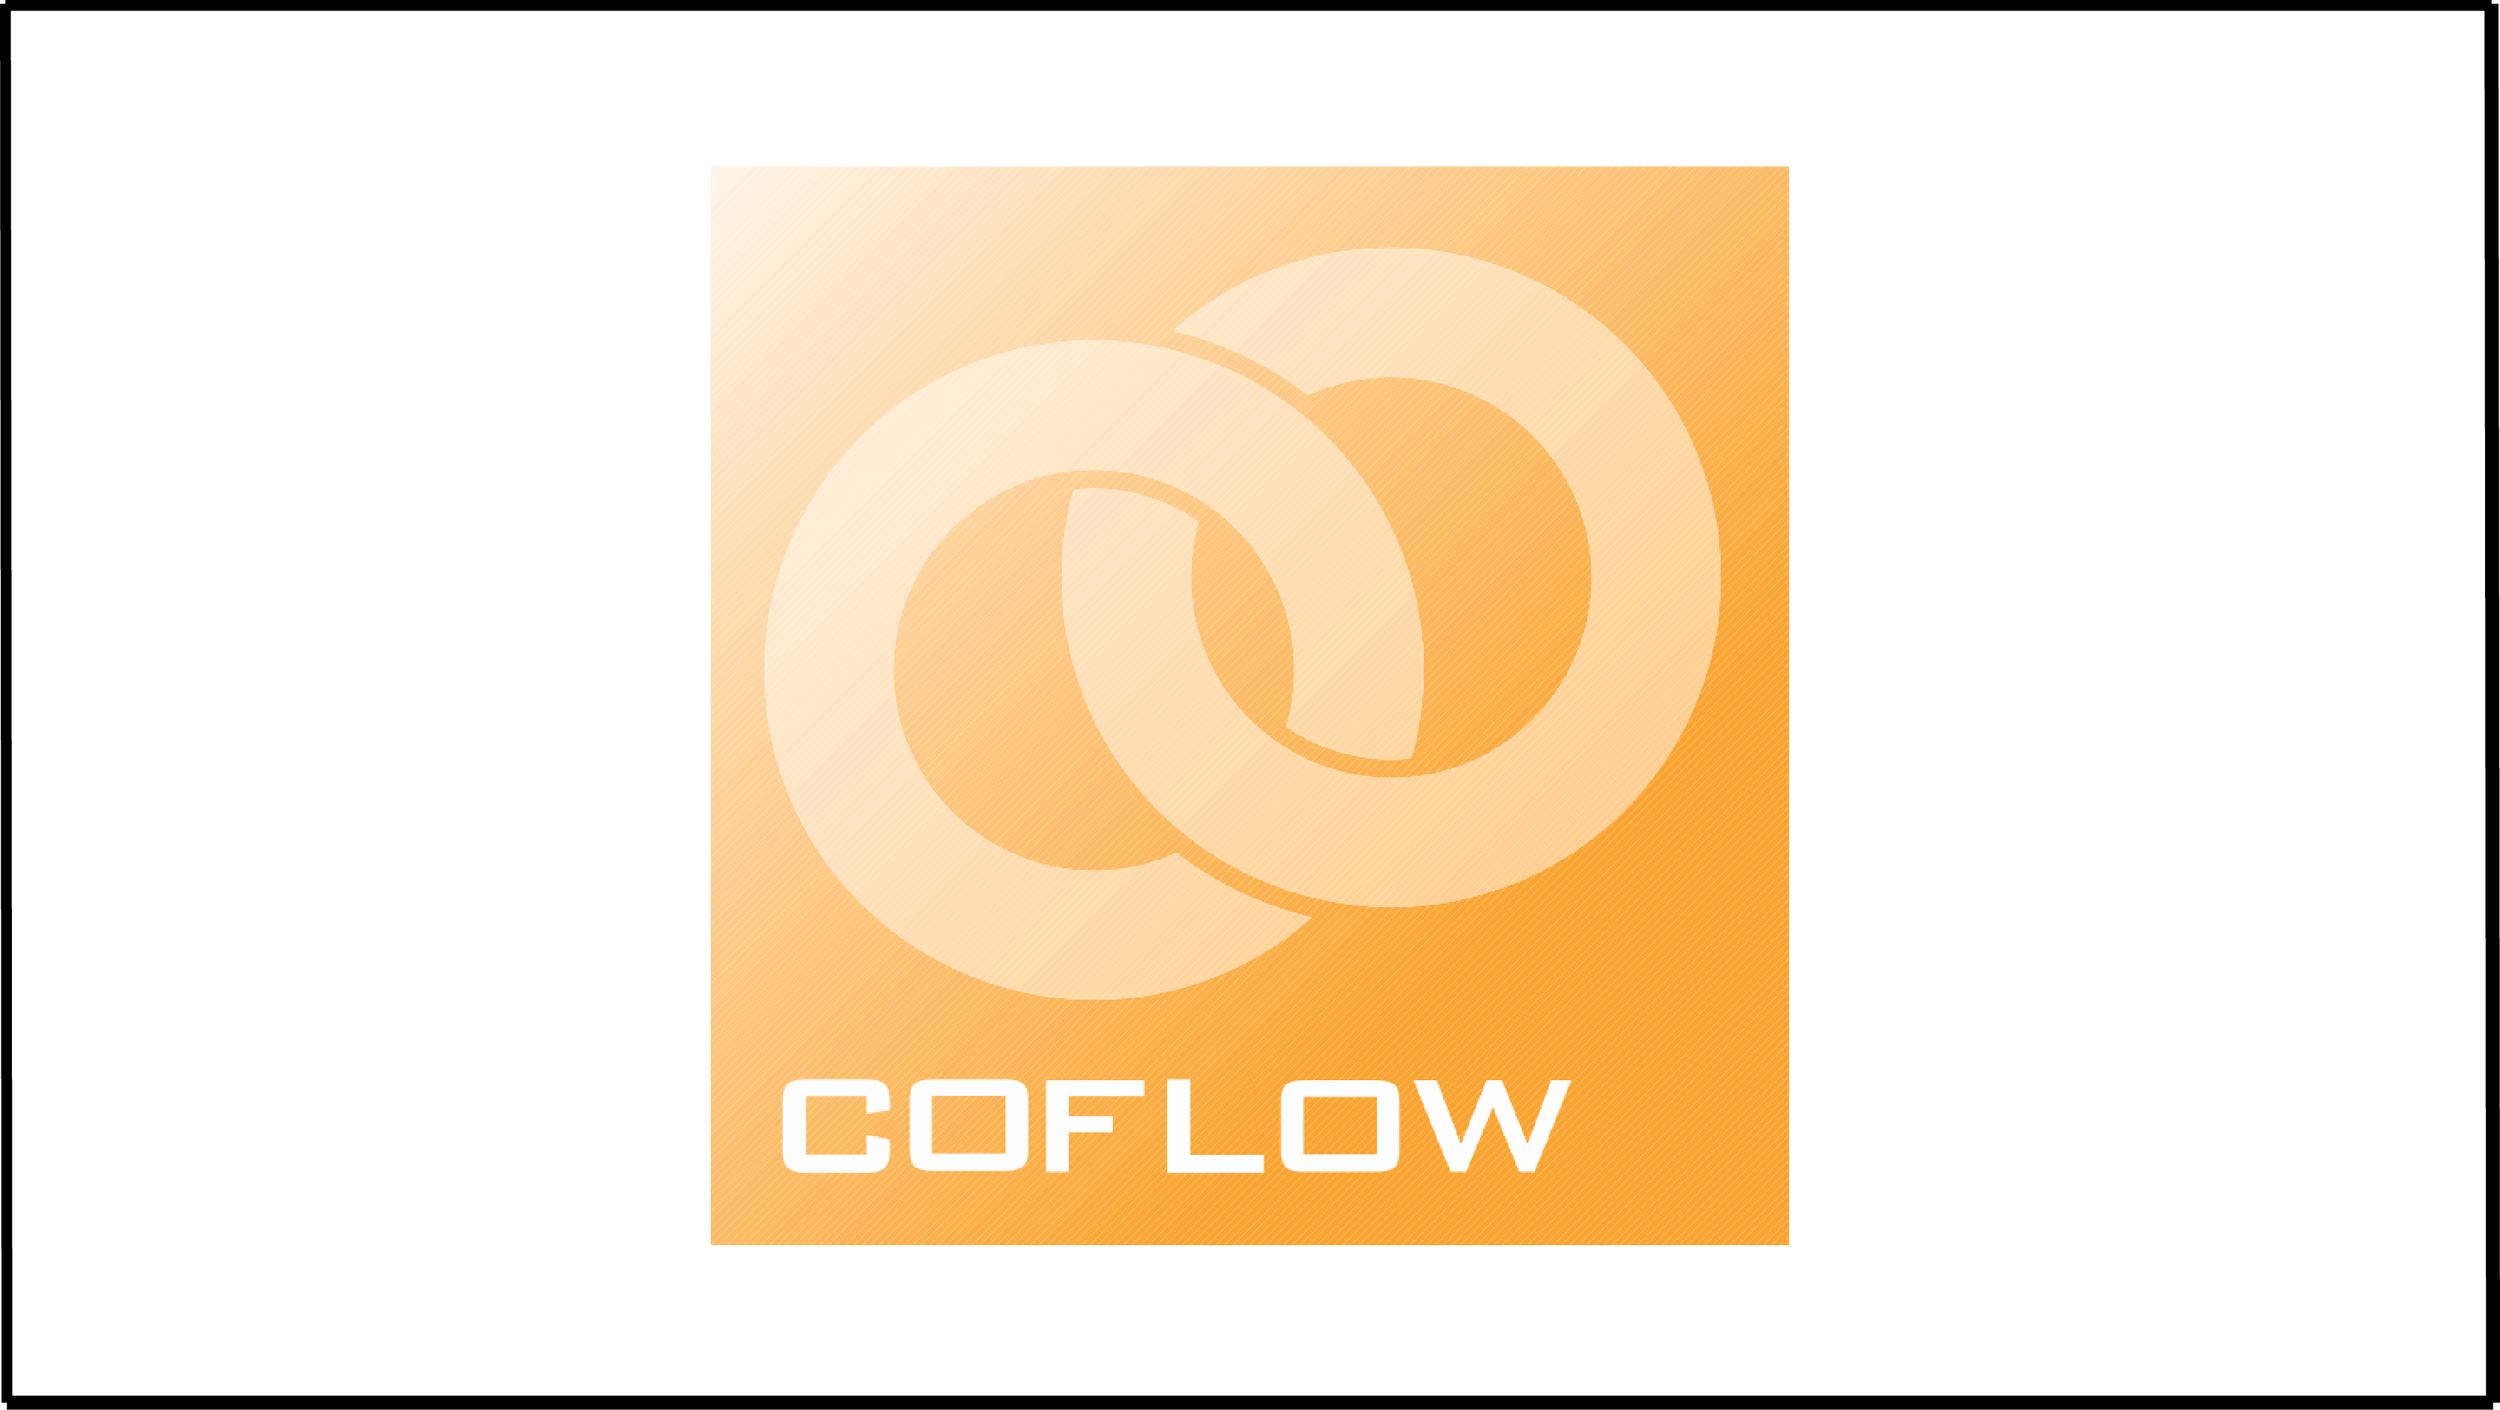 Coflow.png